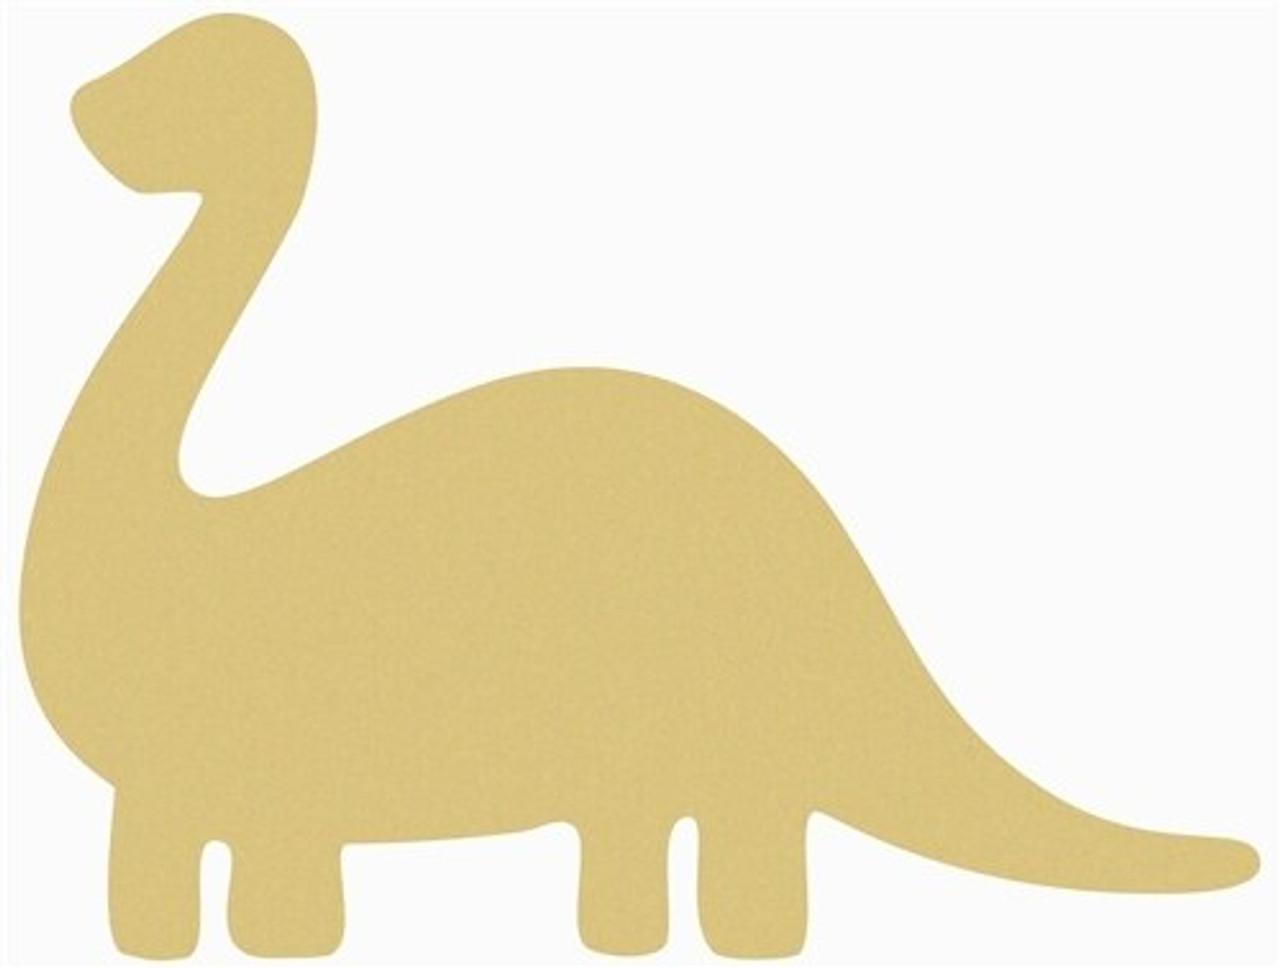 Laser cut mdf craft shapes blank 15cm Personalised Dinosaur names